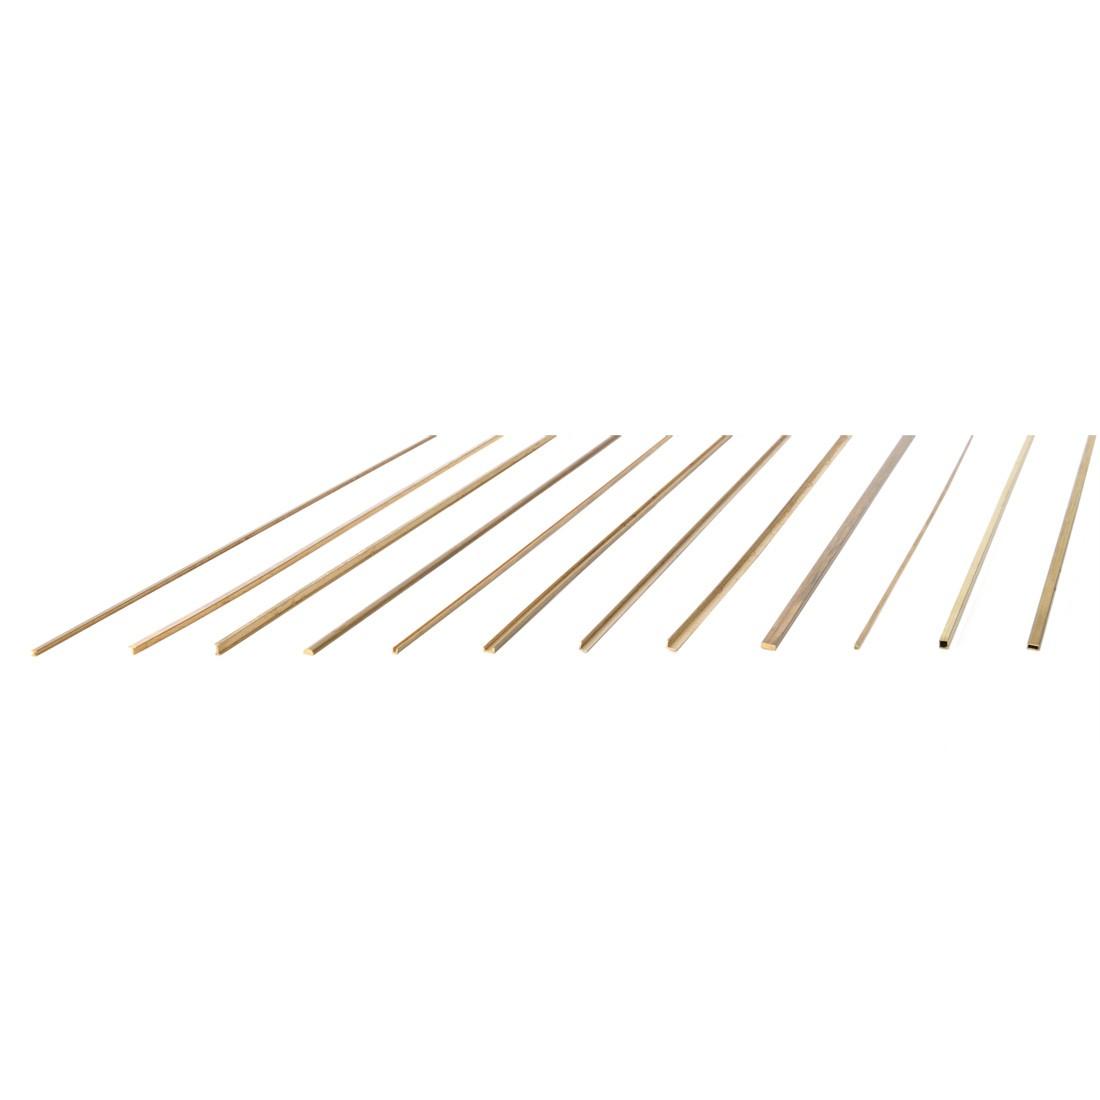 Microprofilati Ottone mm. 2x1x500 sez. rettangolare